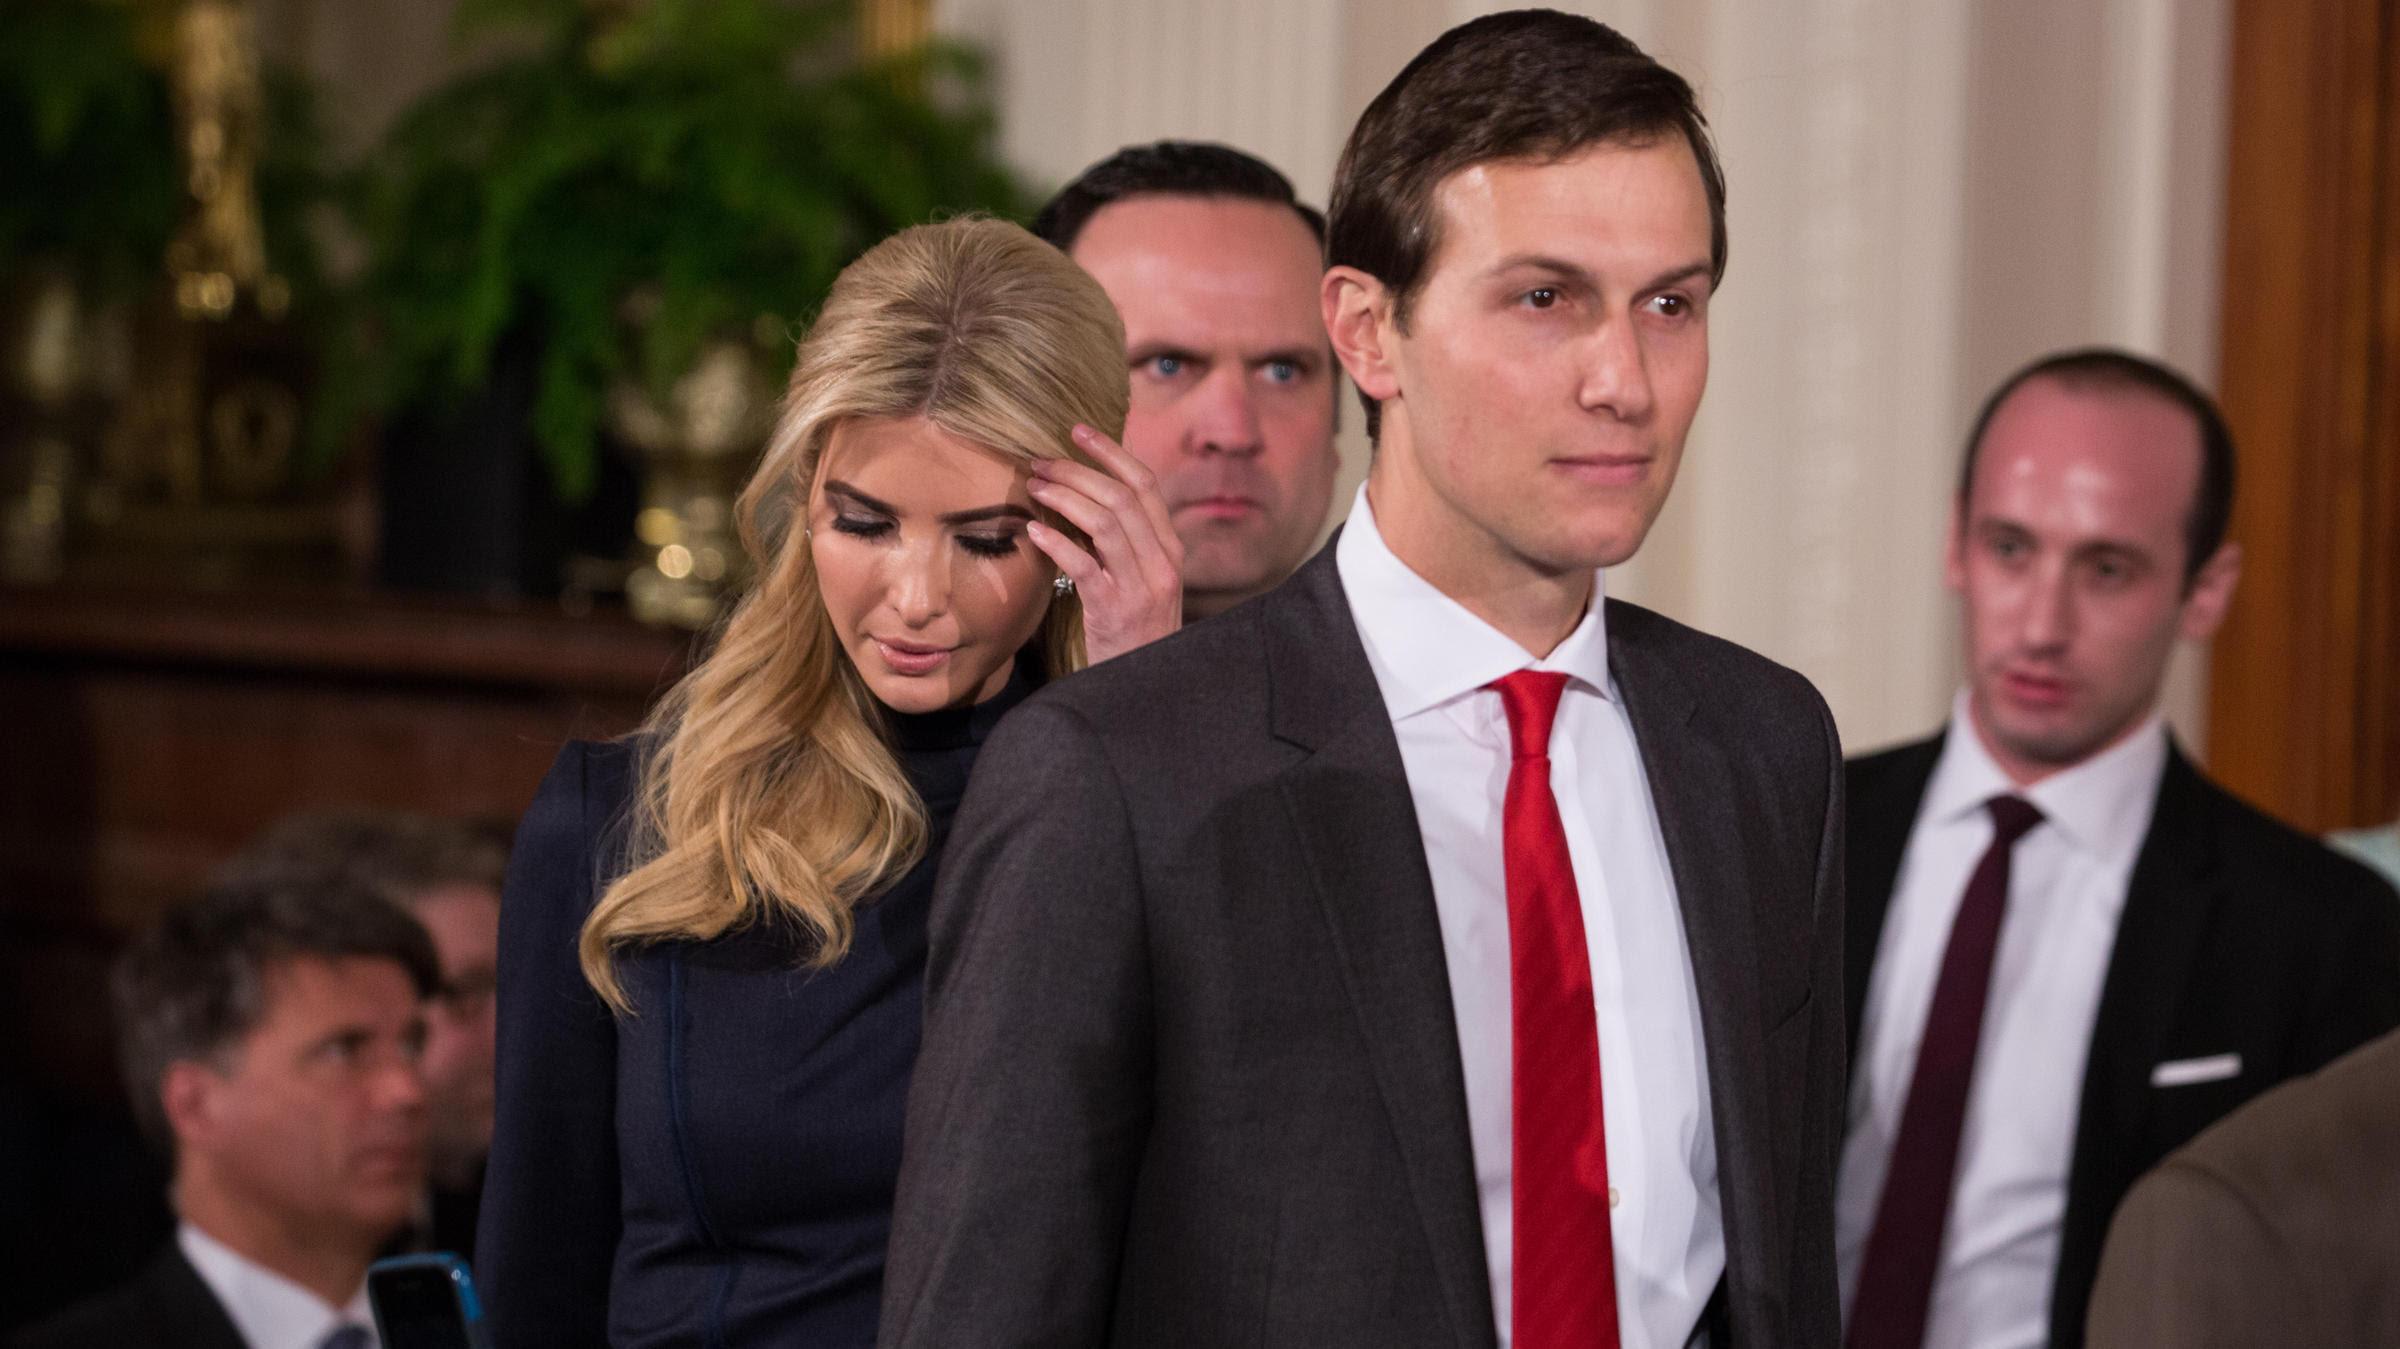 Image result for Trump-Kushner crime family, New Abwehr political campaign contributors